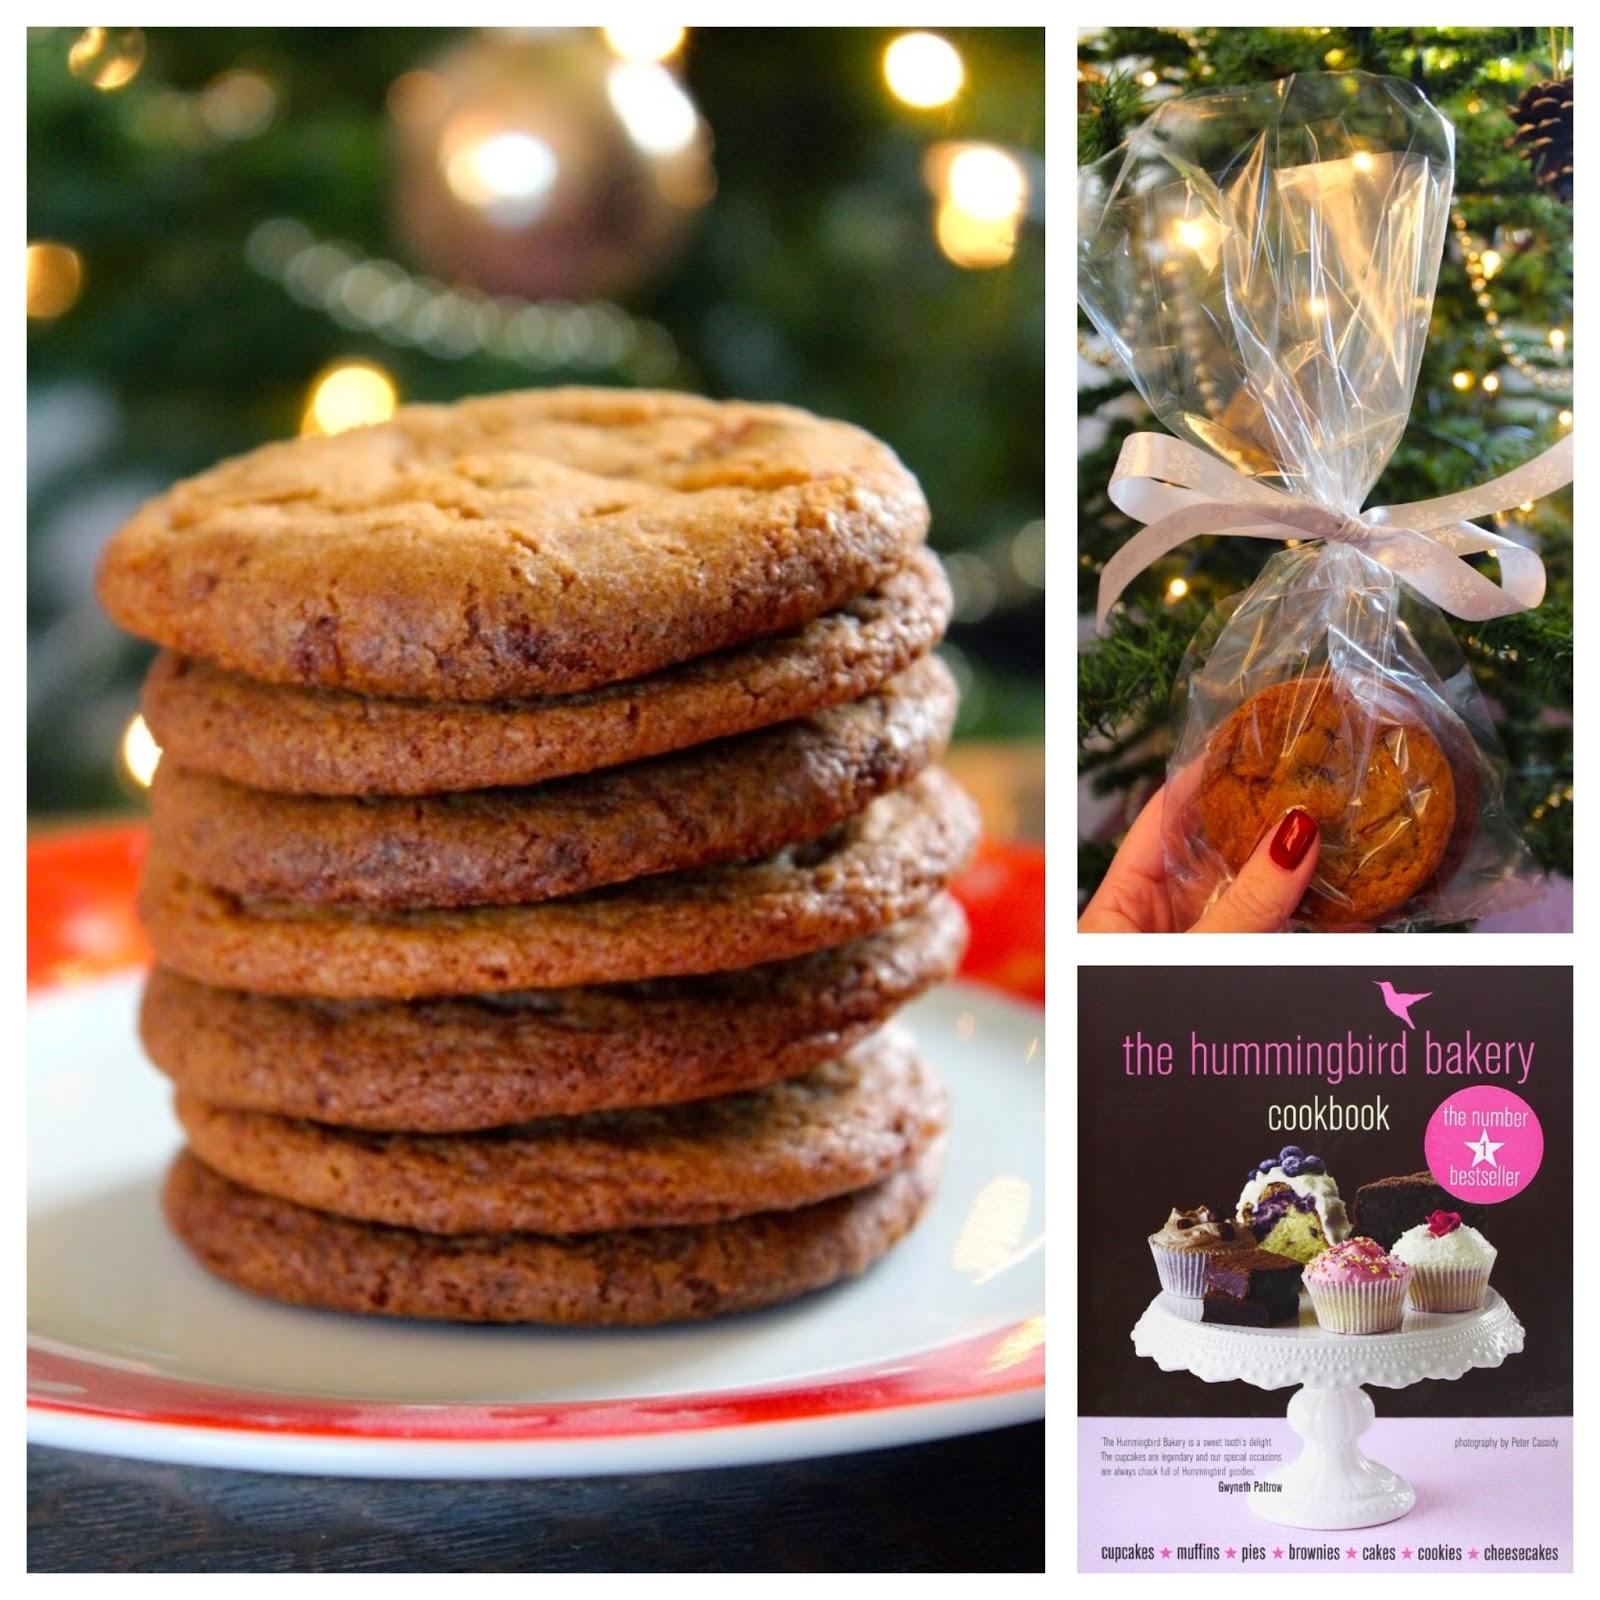 The hummingbird bakery cookies recipes